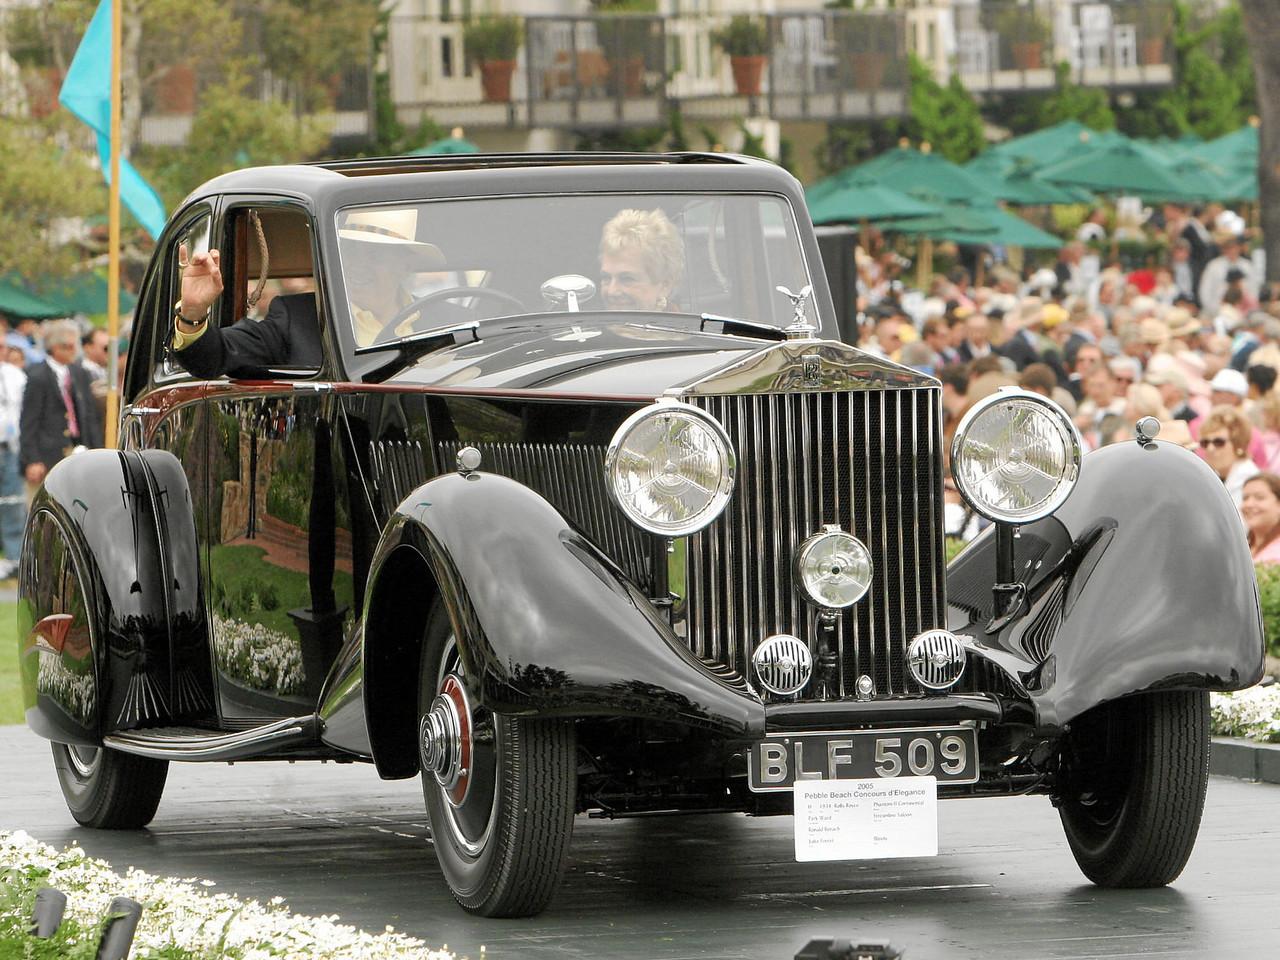 1934 Rolls-Royce Phantom II Continental Park Ward Streamline Saloon owned by Ronald Benach from Lake Forest, Illinois 1st Class H (Rolls-Royce Prewar)